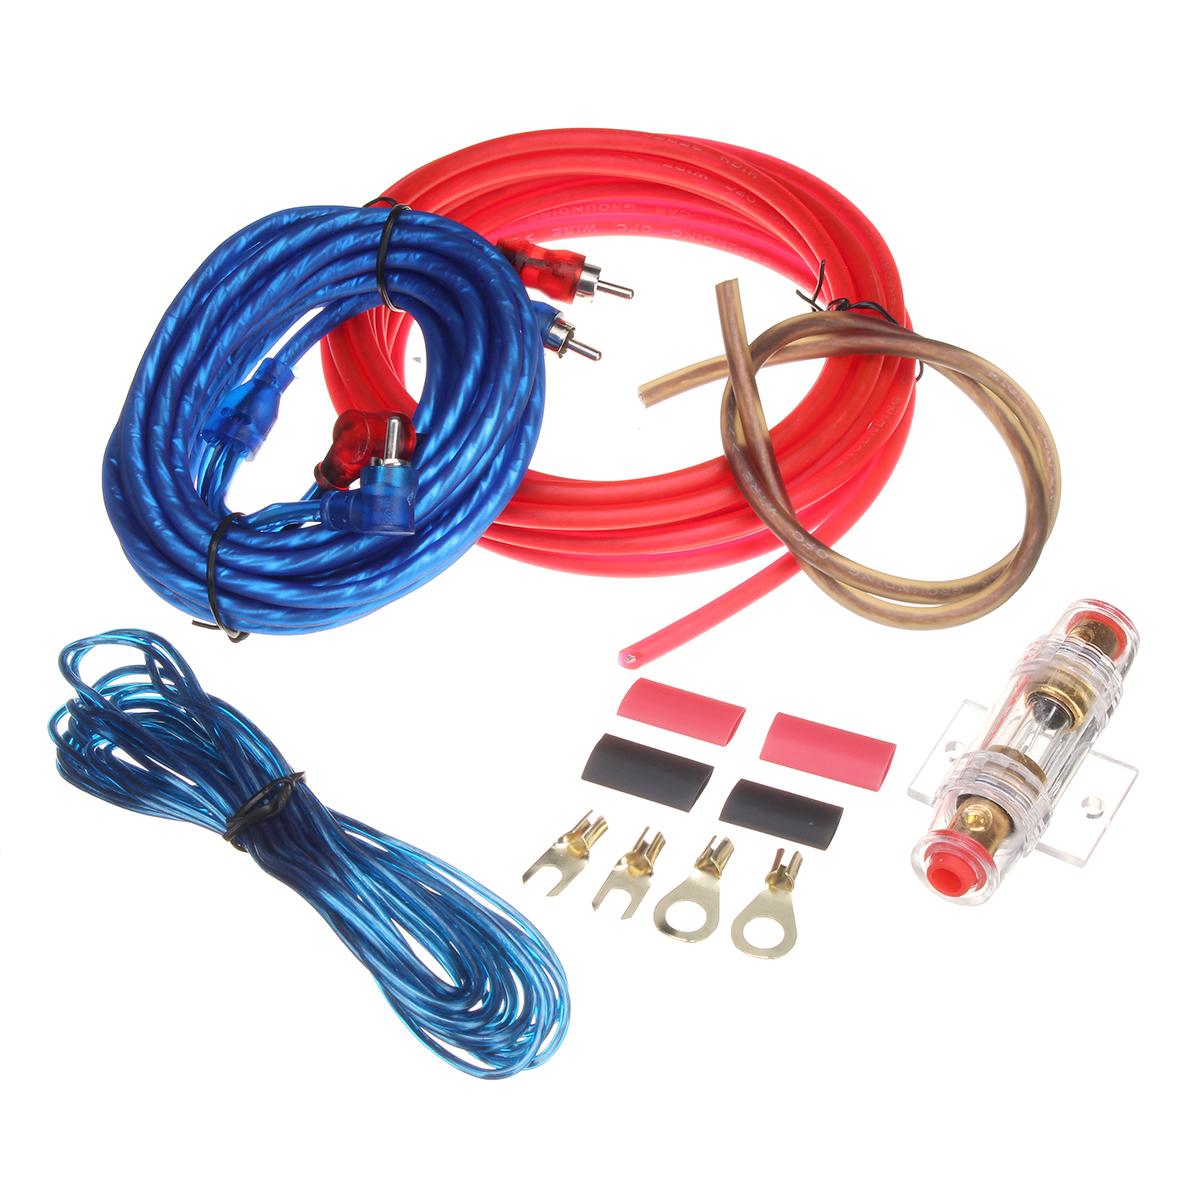 Авто Аудио сабвуфер Sub Усилитель AMP RCA Wiring Набор Power Audio Cable 10GA 4.5M